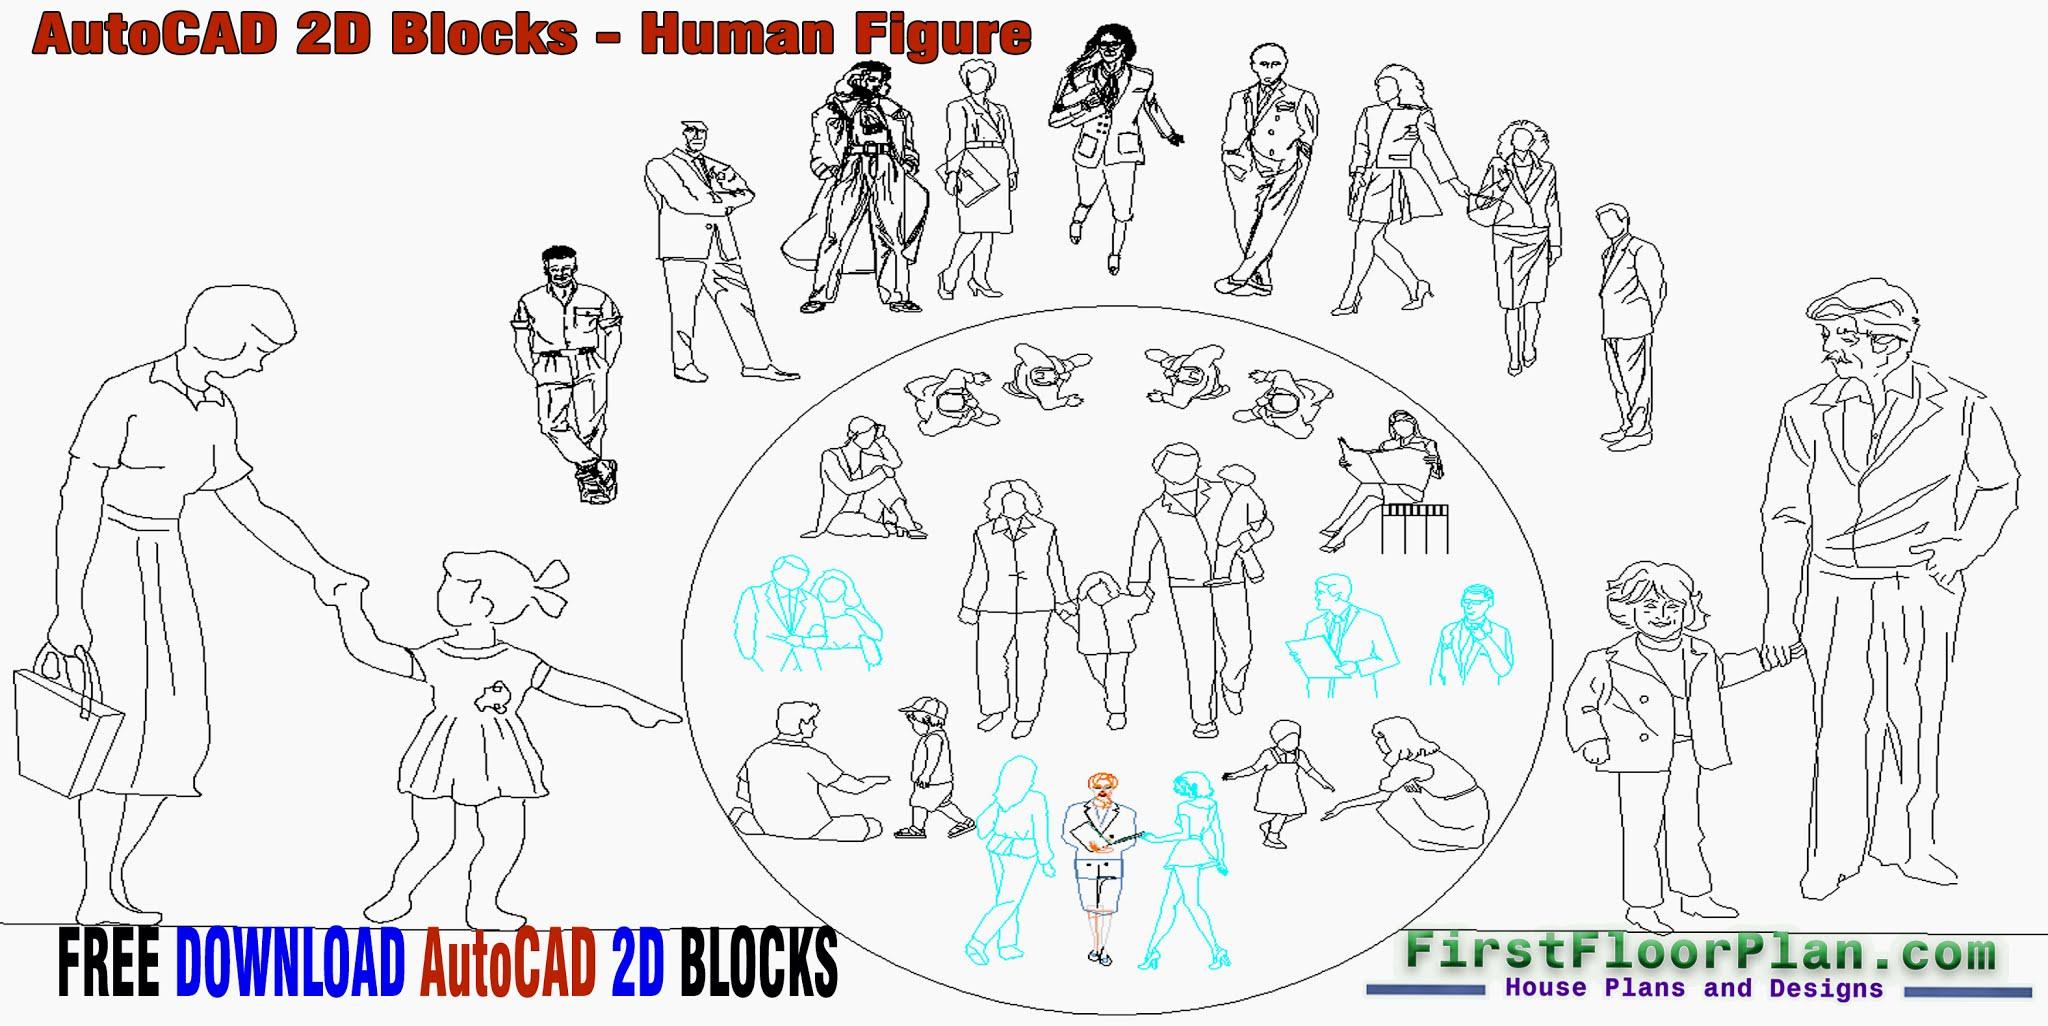 AutoCAD 2D Blocks Human Figure, AutoCAD 2D Blocks Free Download